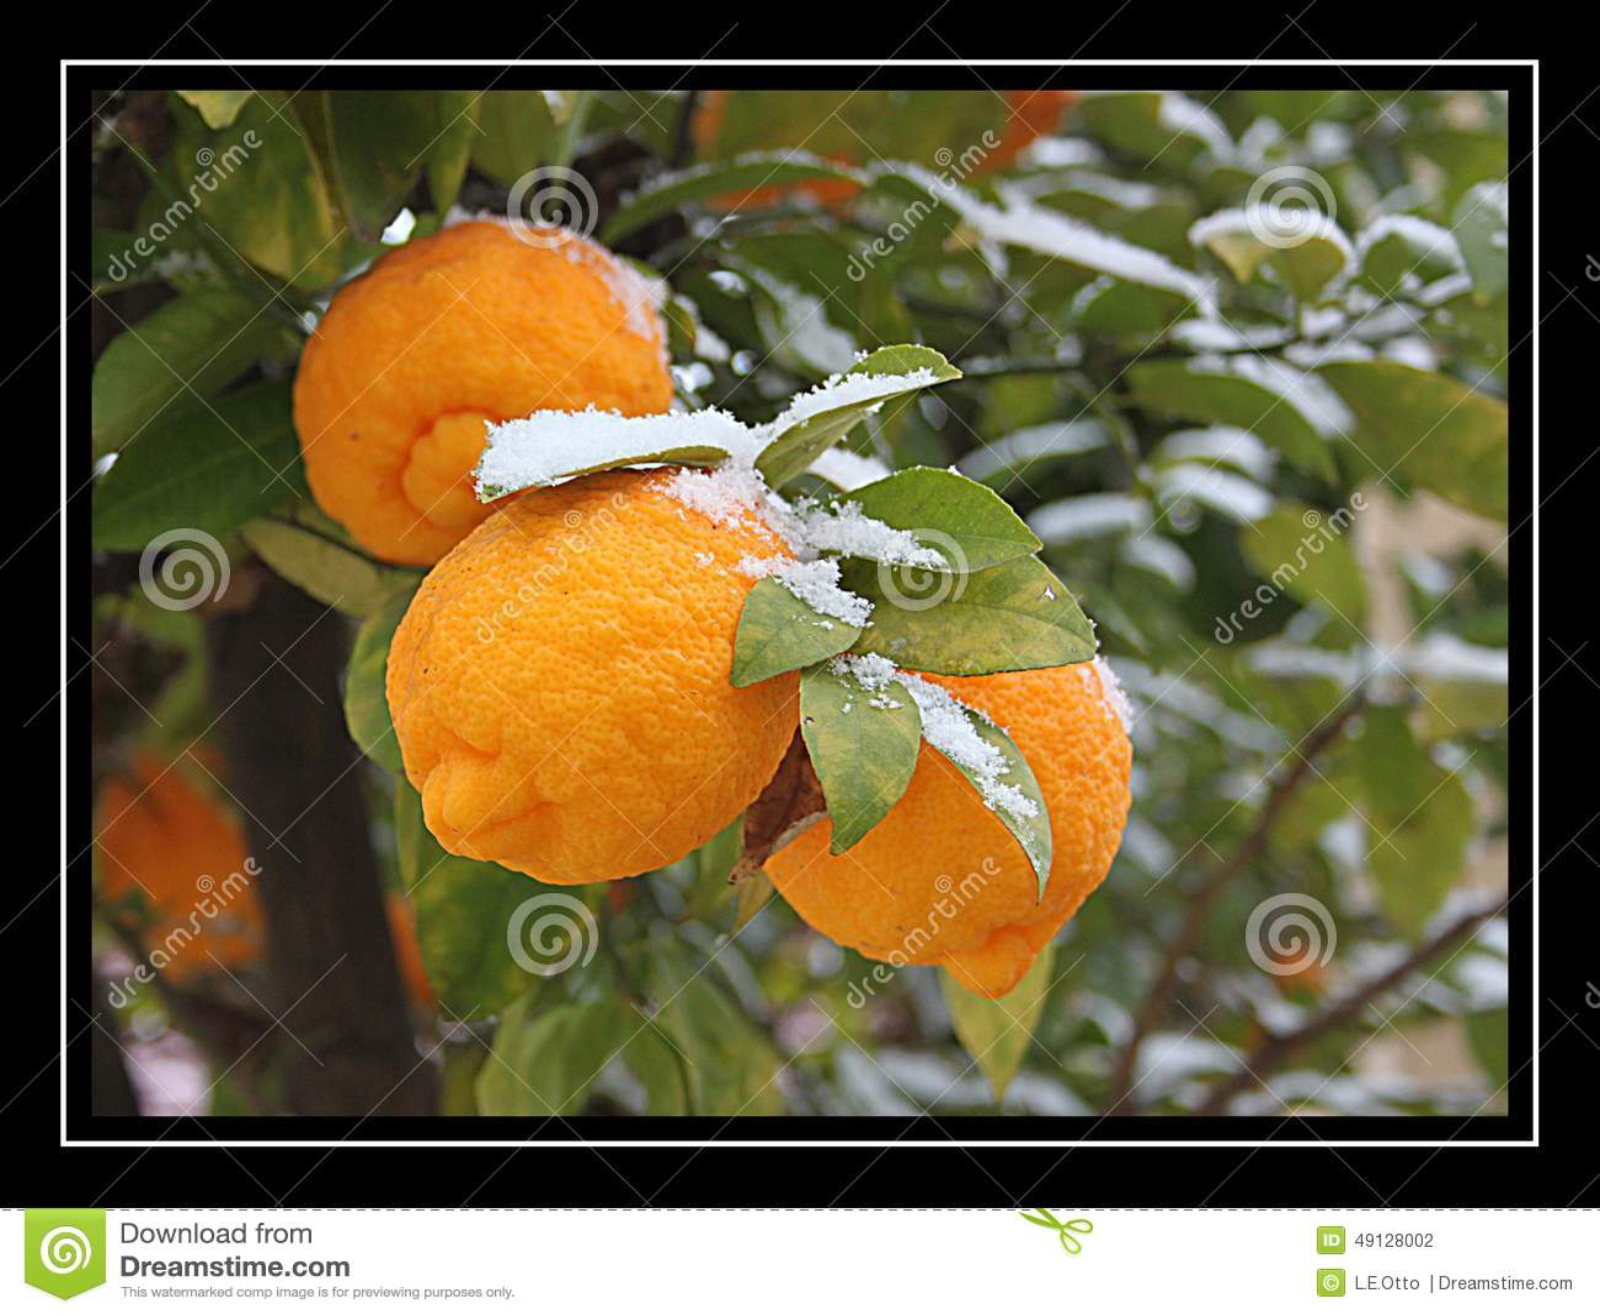 Limón en nieve